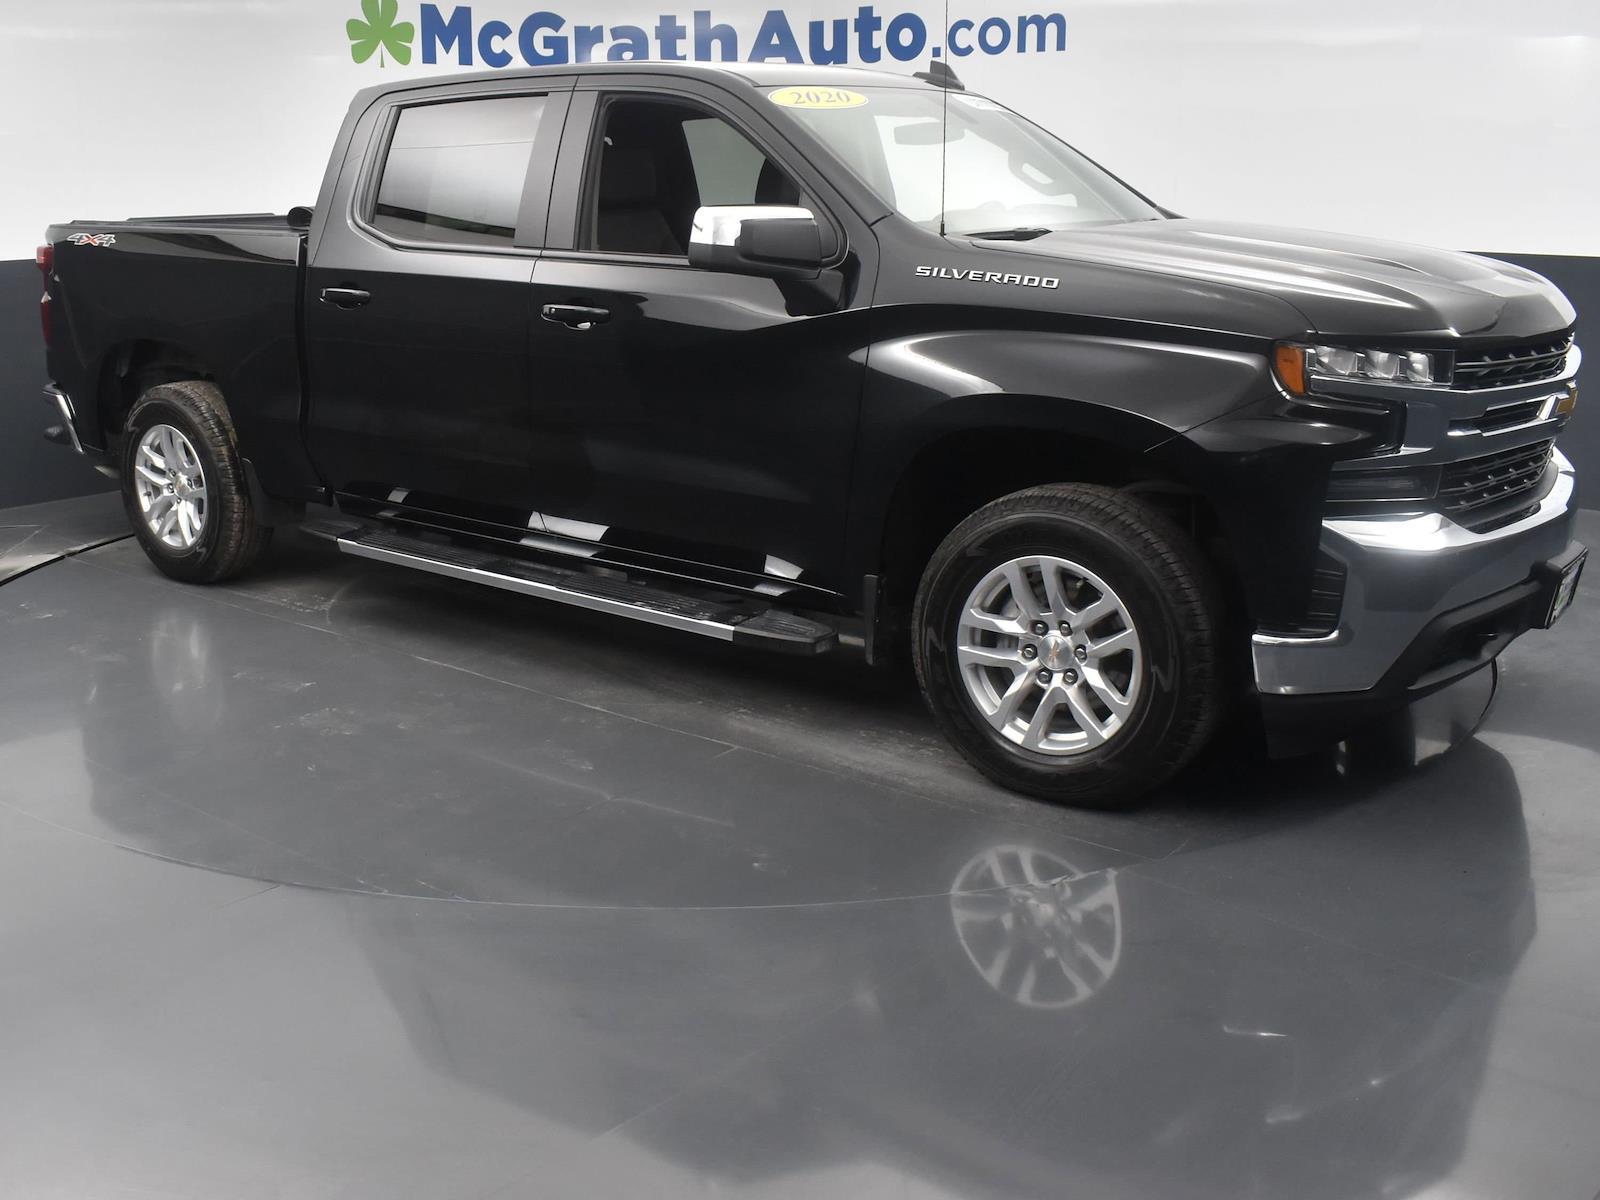 2020 Chevrolet Silverado 1500 Crew Cab 4x4, Pickup #C201419 - photo 1